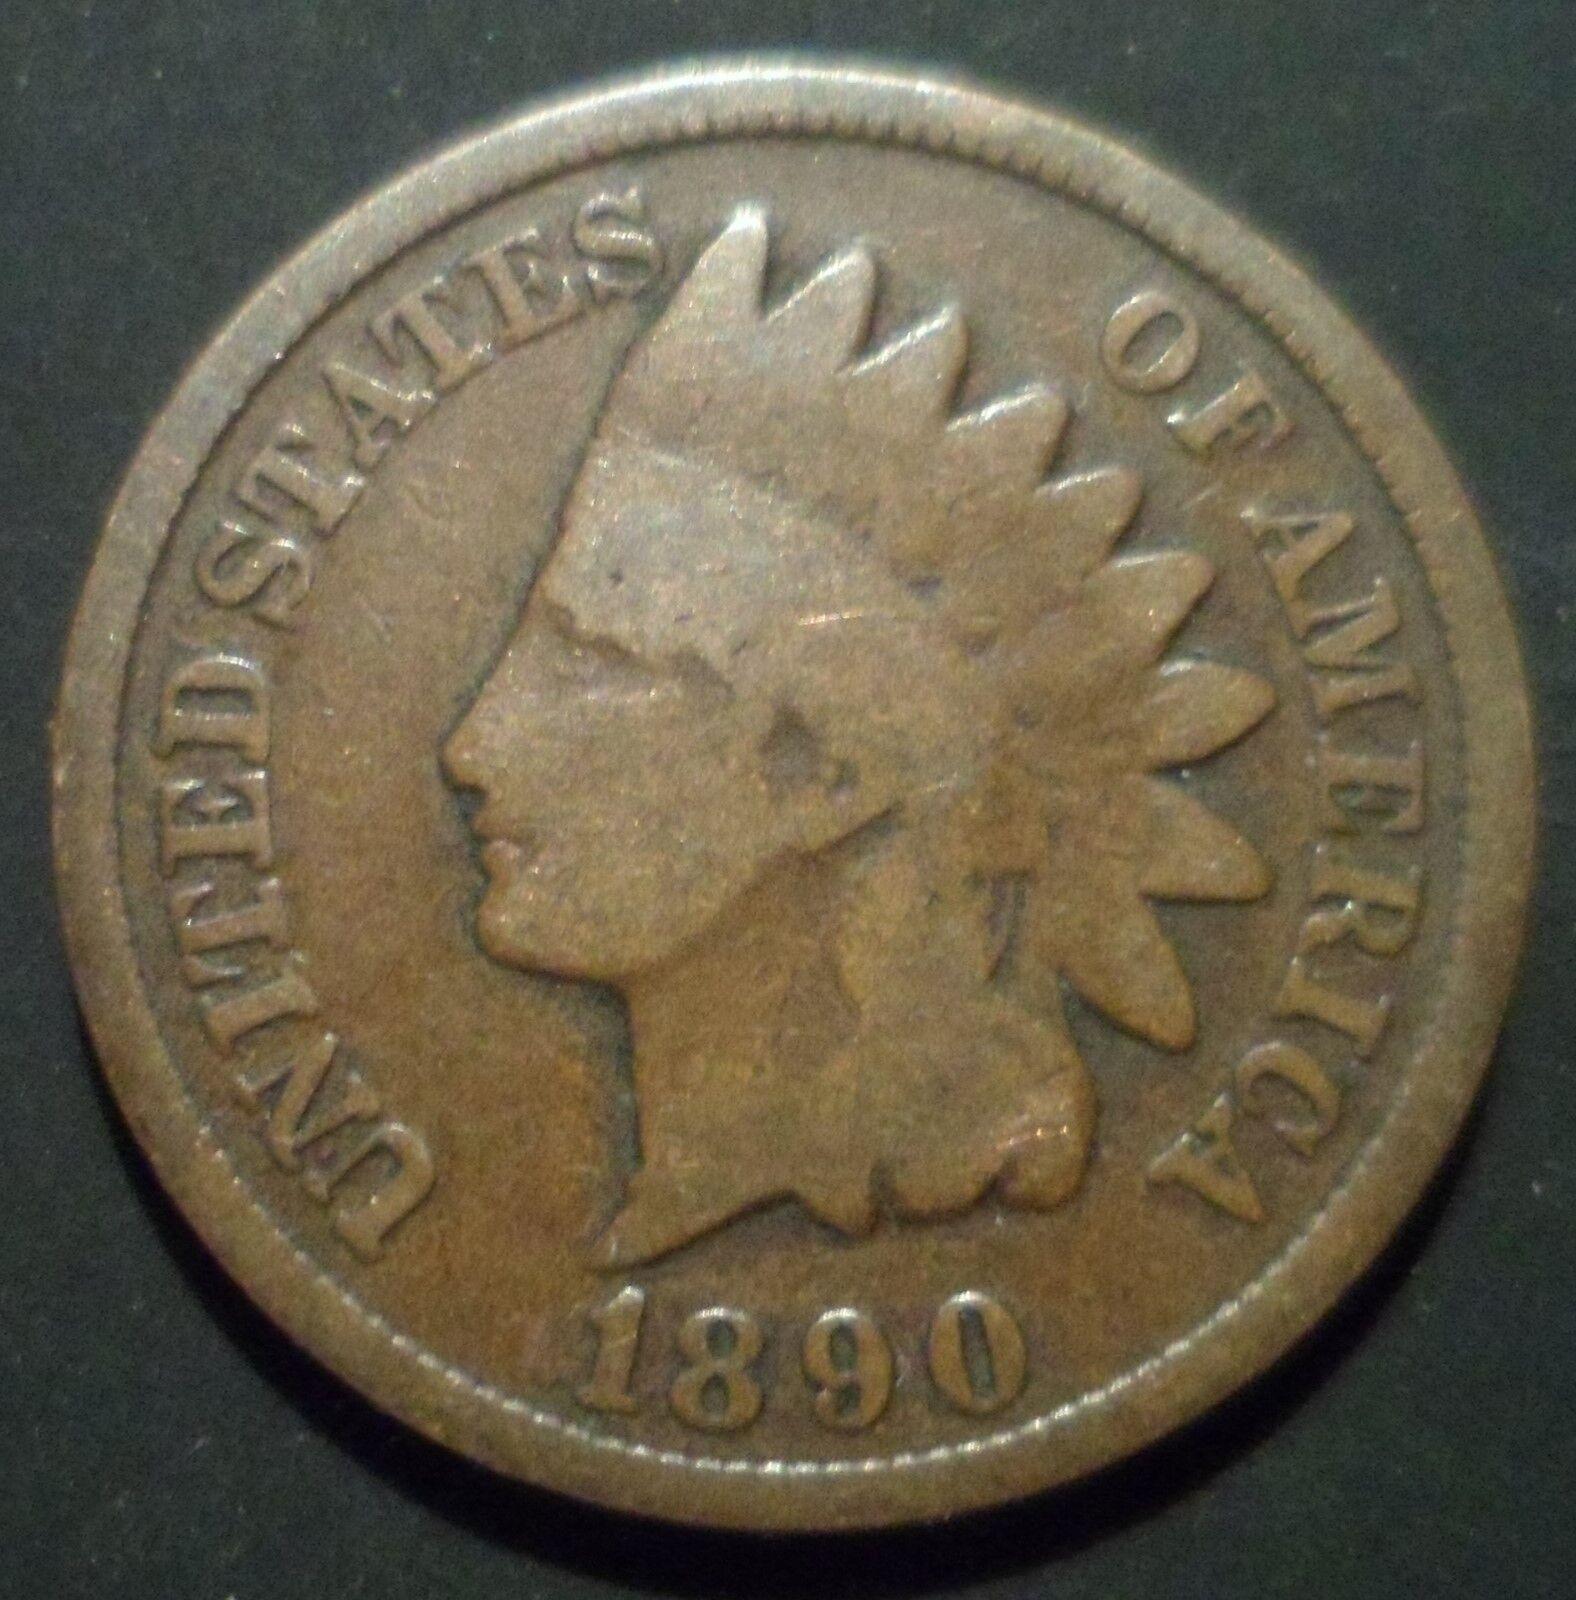 1890 Indian Head Cent Snow 1 S1 DDO QDO Quadruple Die Mint Error 3 Star A3 - $24.95